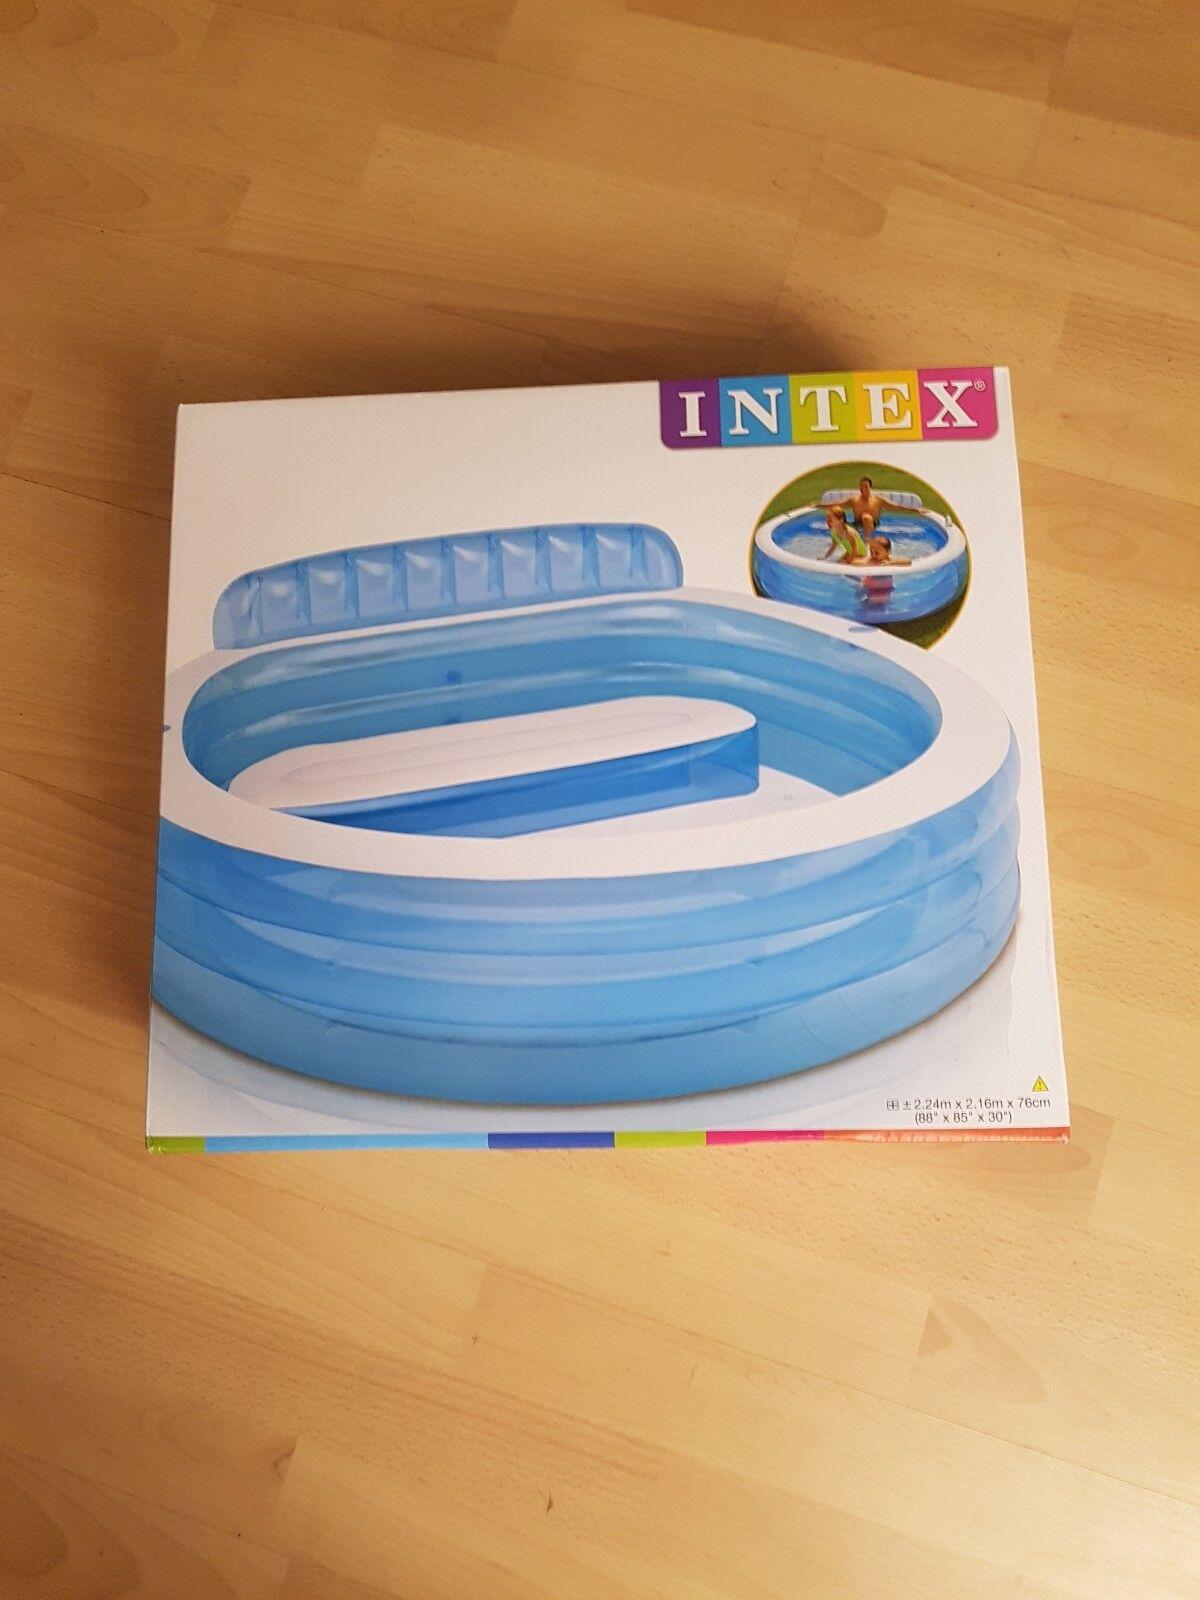 INTEX Swim Center Lounge Family  Pool Rund Planschbecken Kinderpool